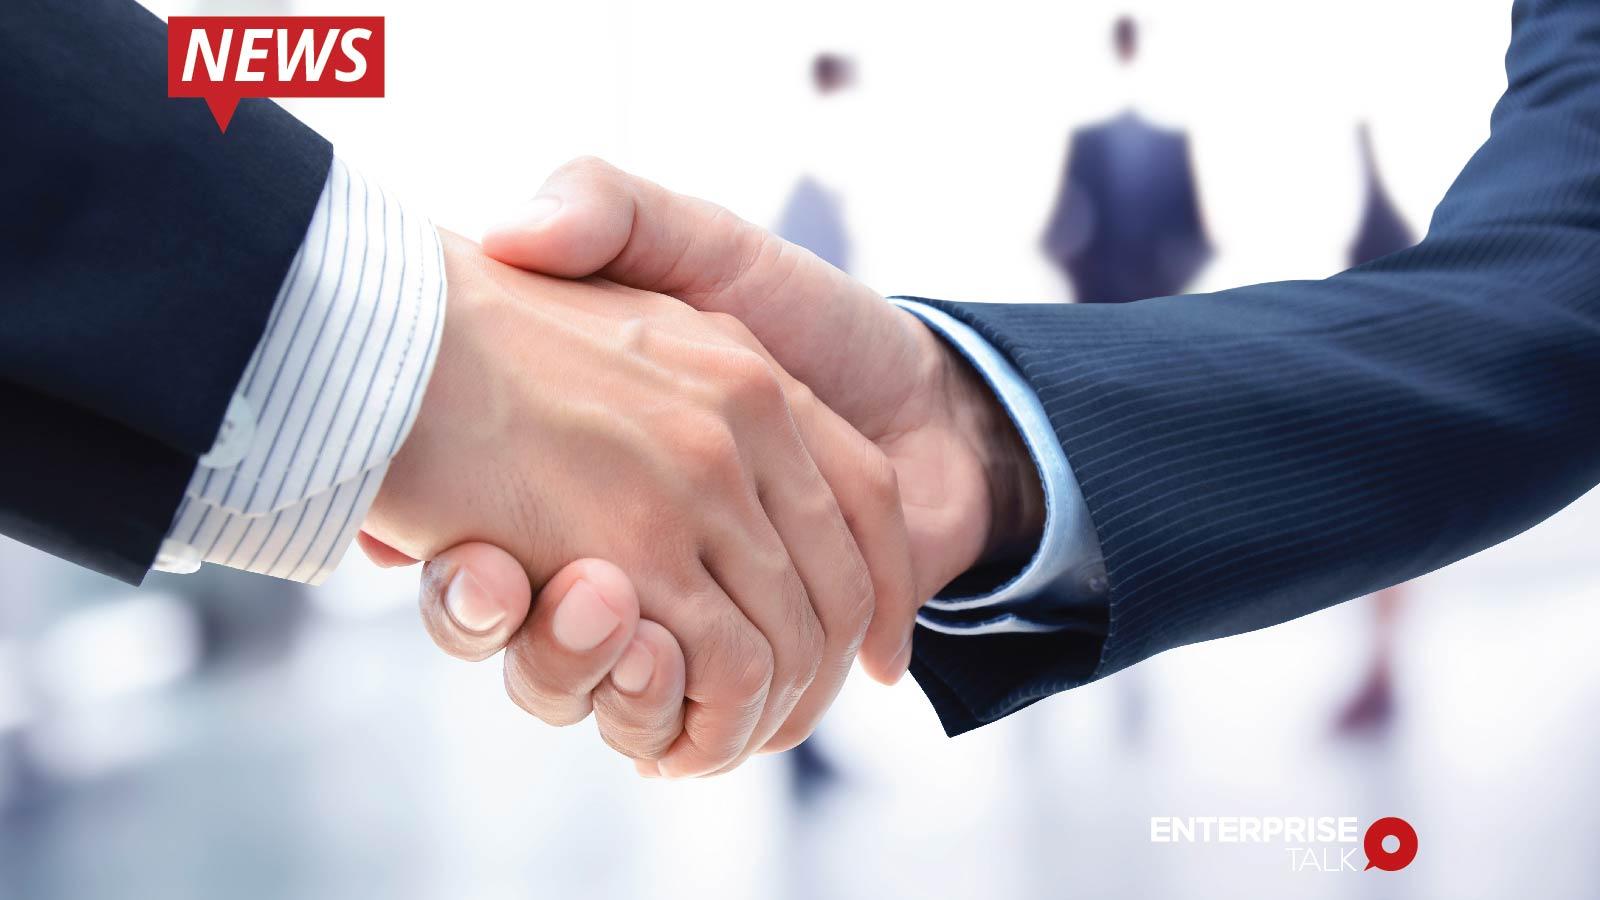 Device42 acquires ArrayIQ